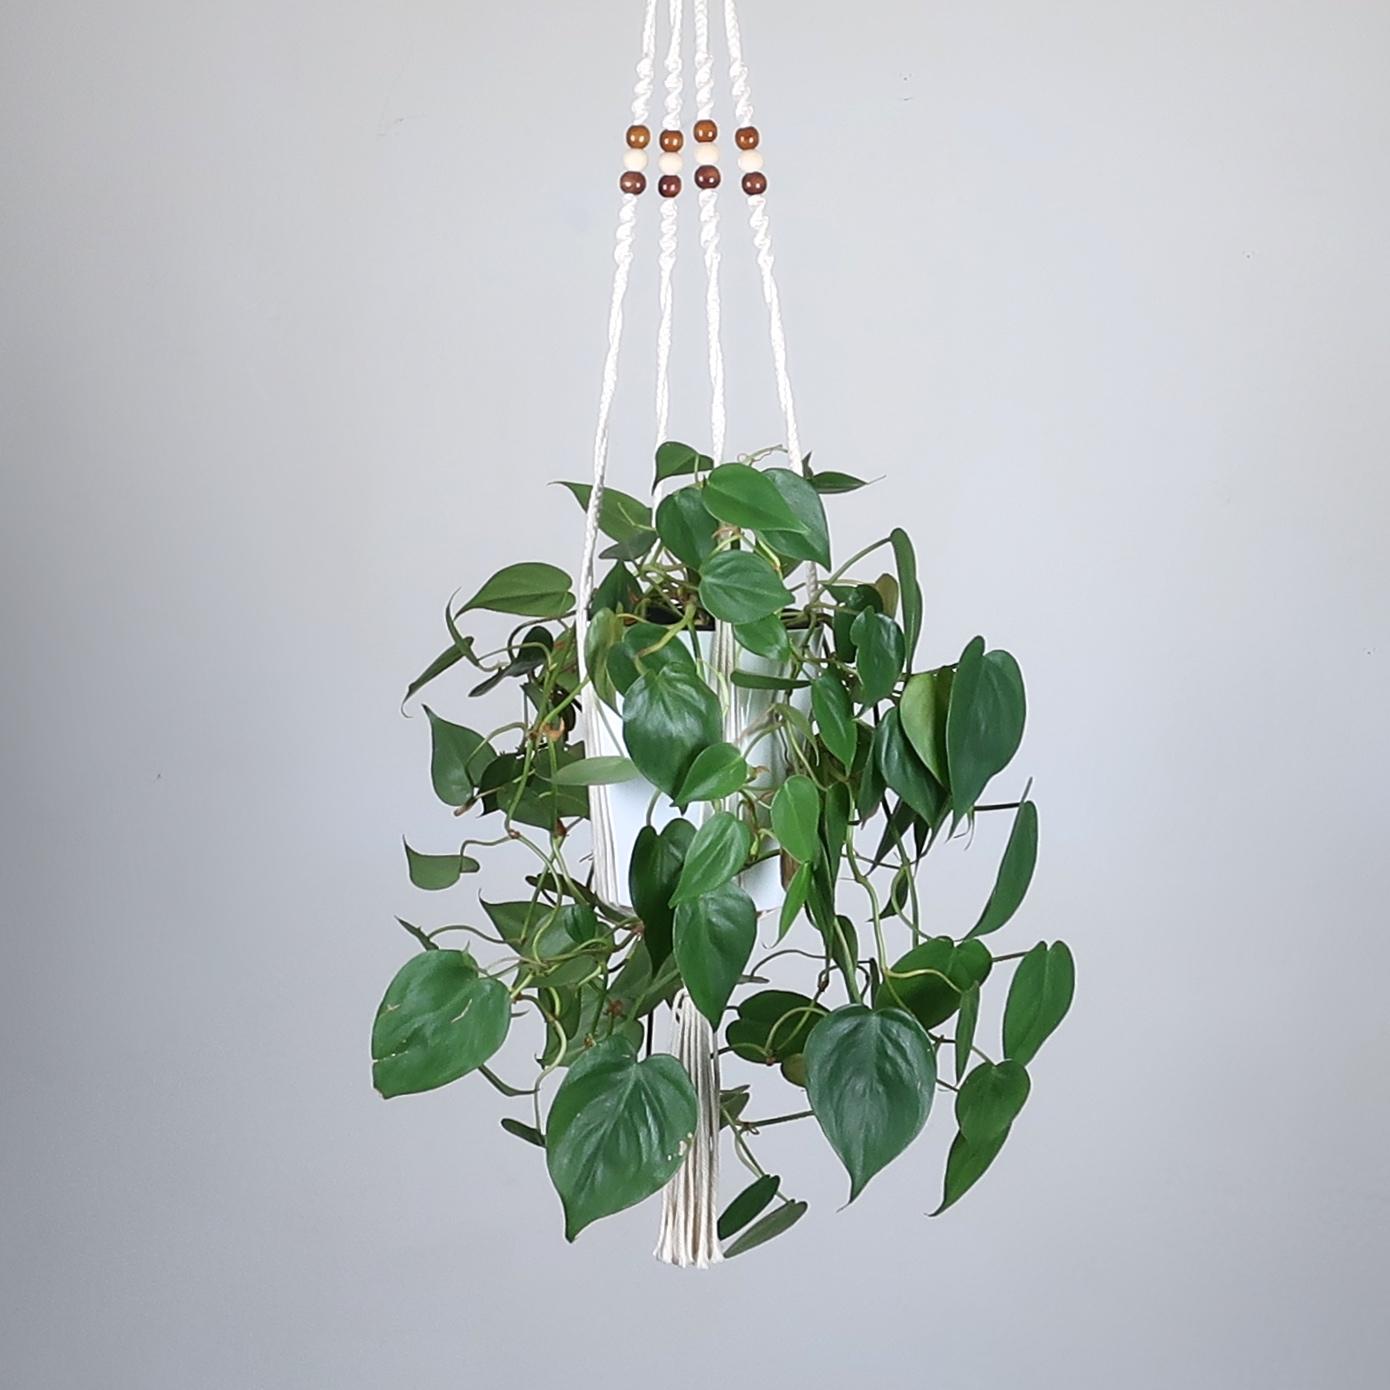 suspension pour plante en macram bymadjo saty d co. Black Bedroom Furniture Sets. Home Design Ideas